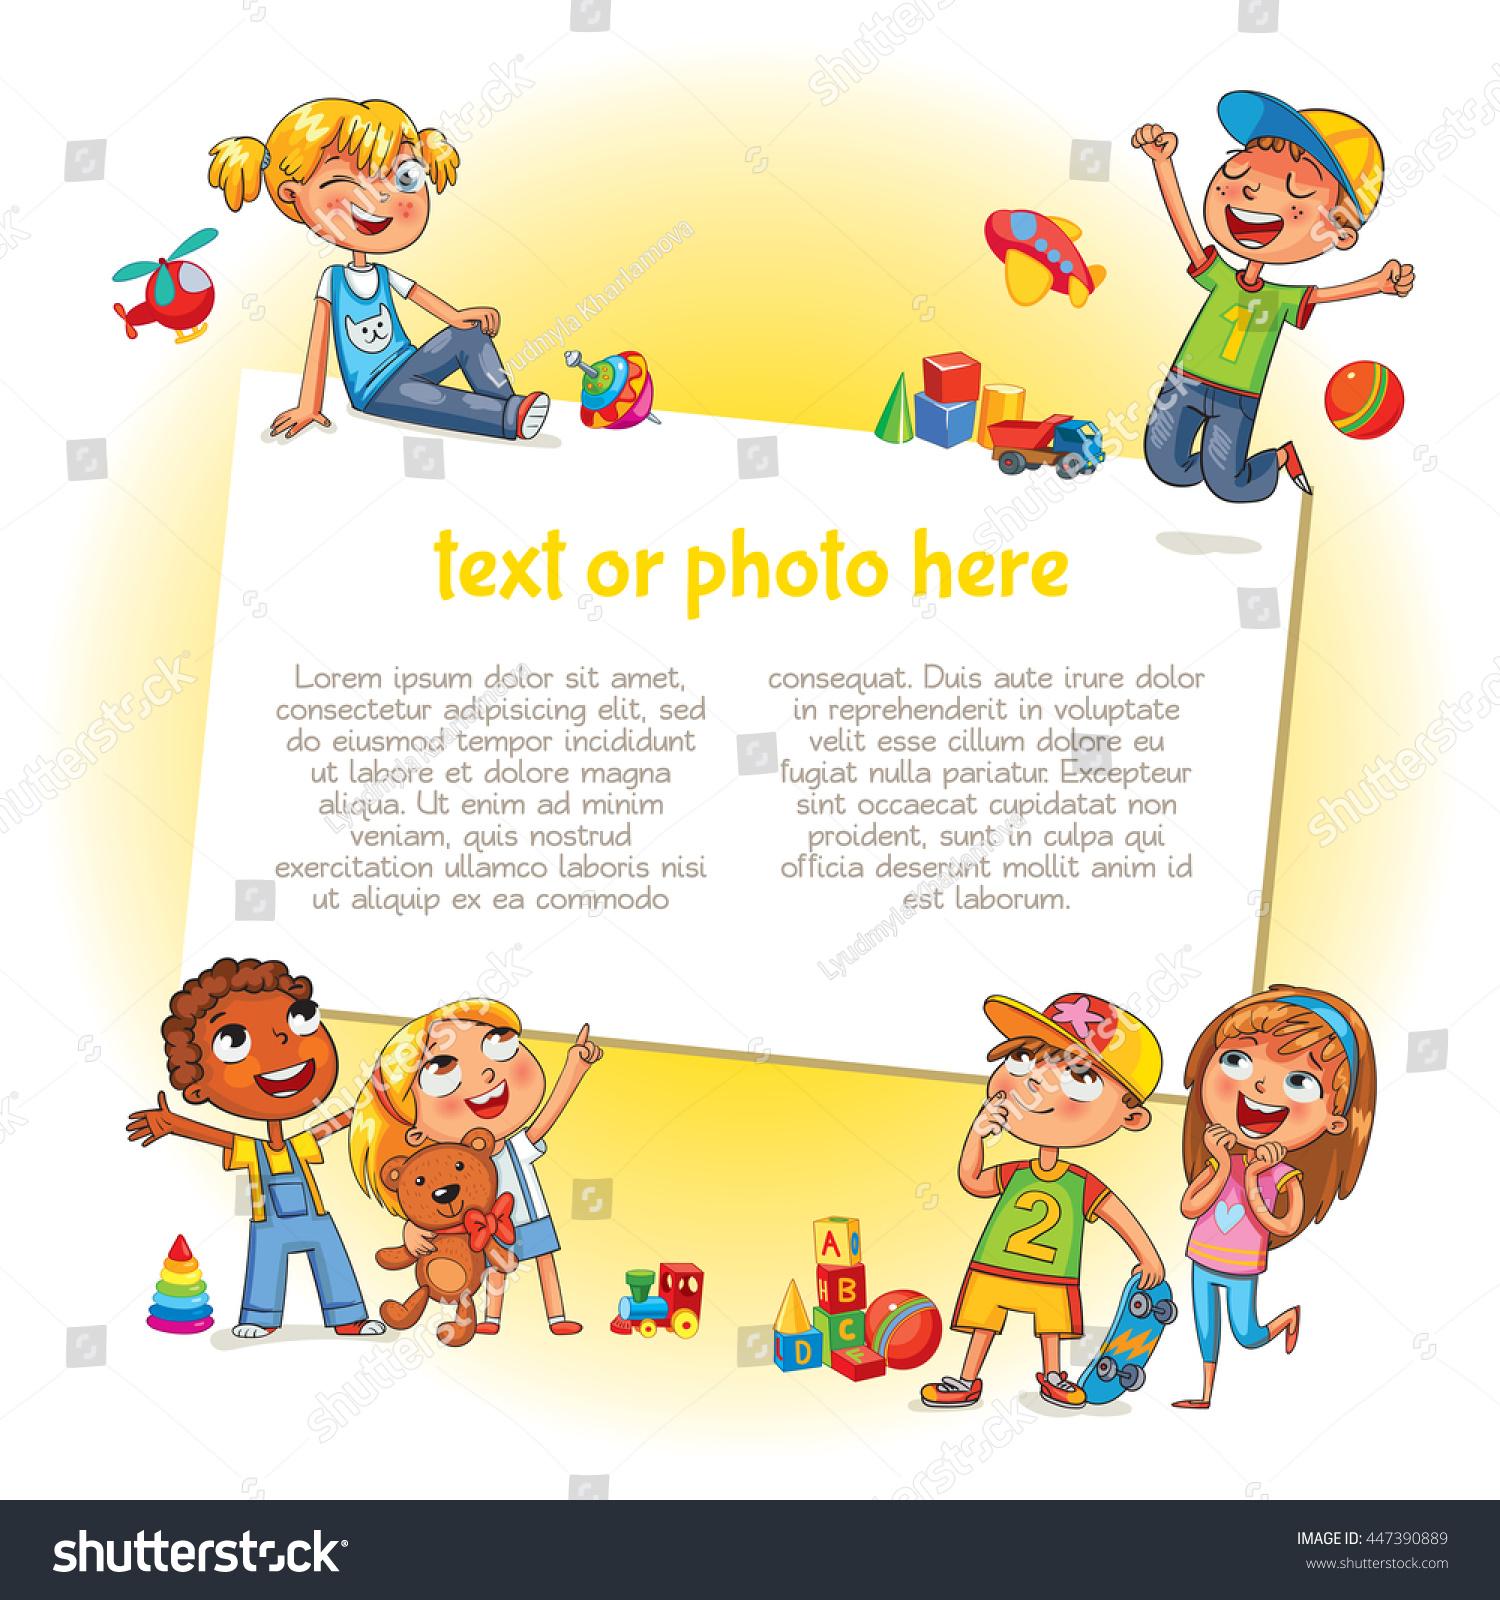 Template Advertising Brochure Ready Your Message Stock-Vektorgrafik ...